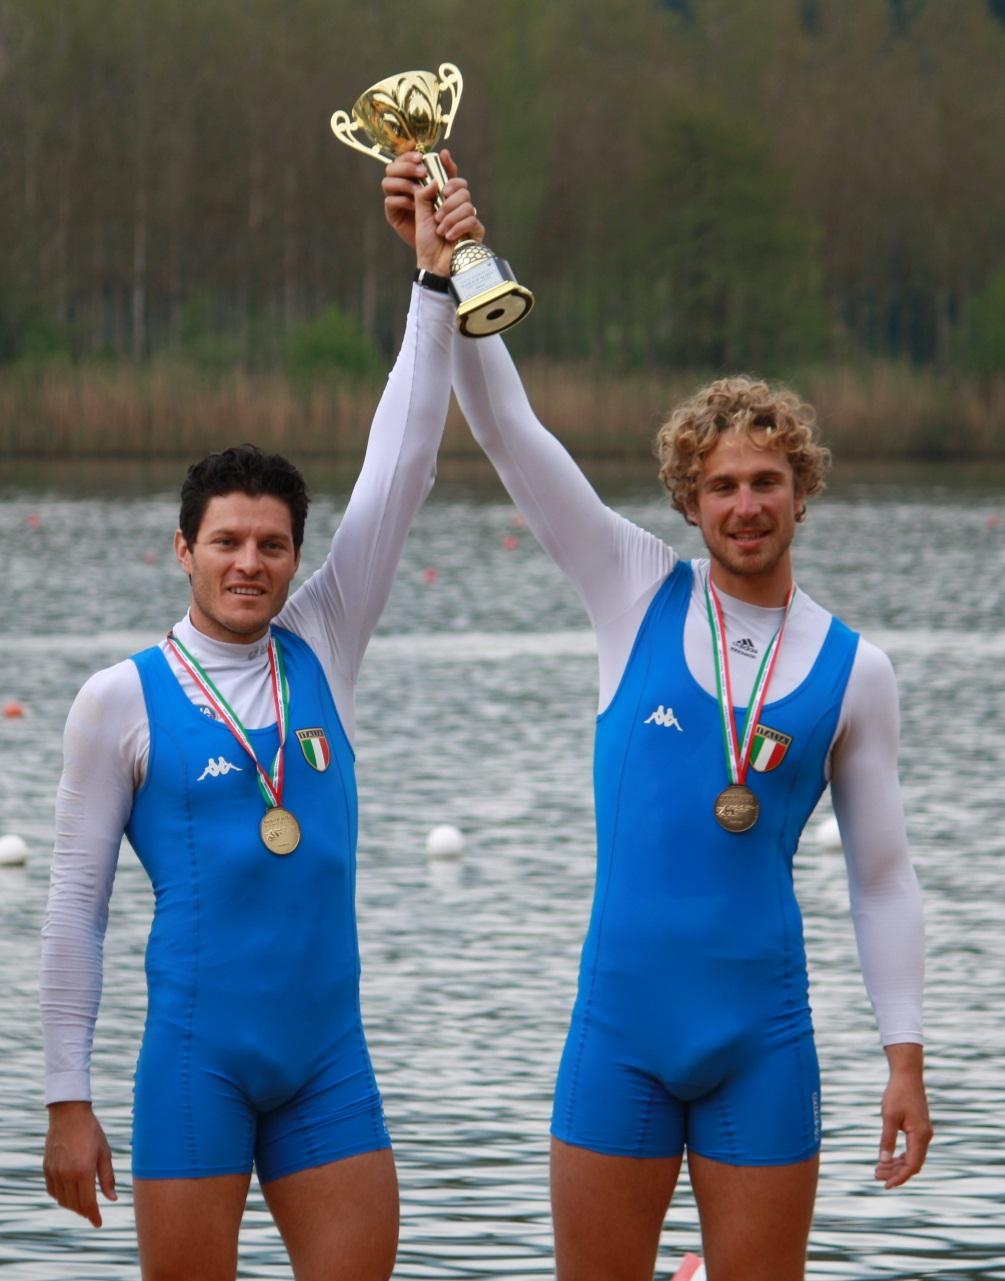 Italian Hotties Beautiful edward's photos of the day: olympic hotties: 9 italian rowers